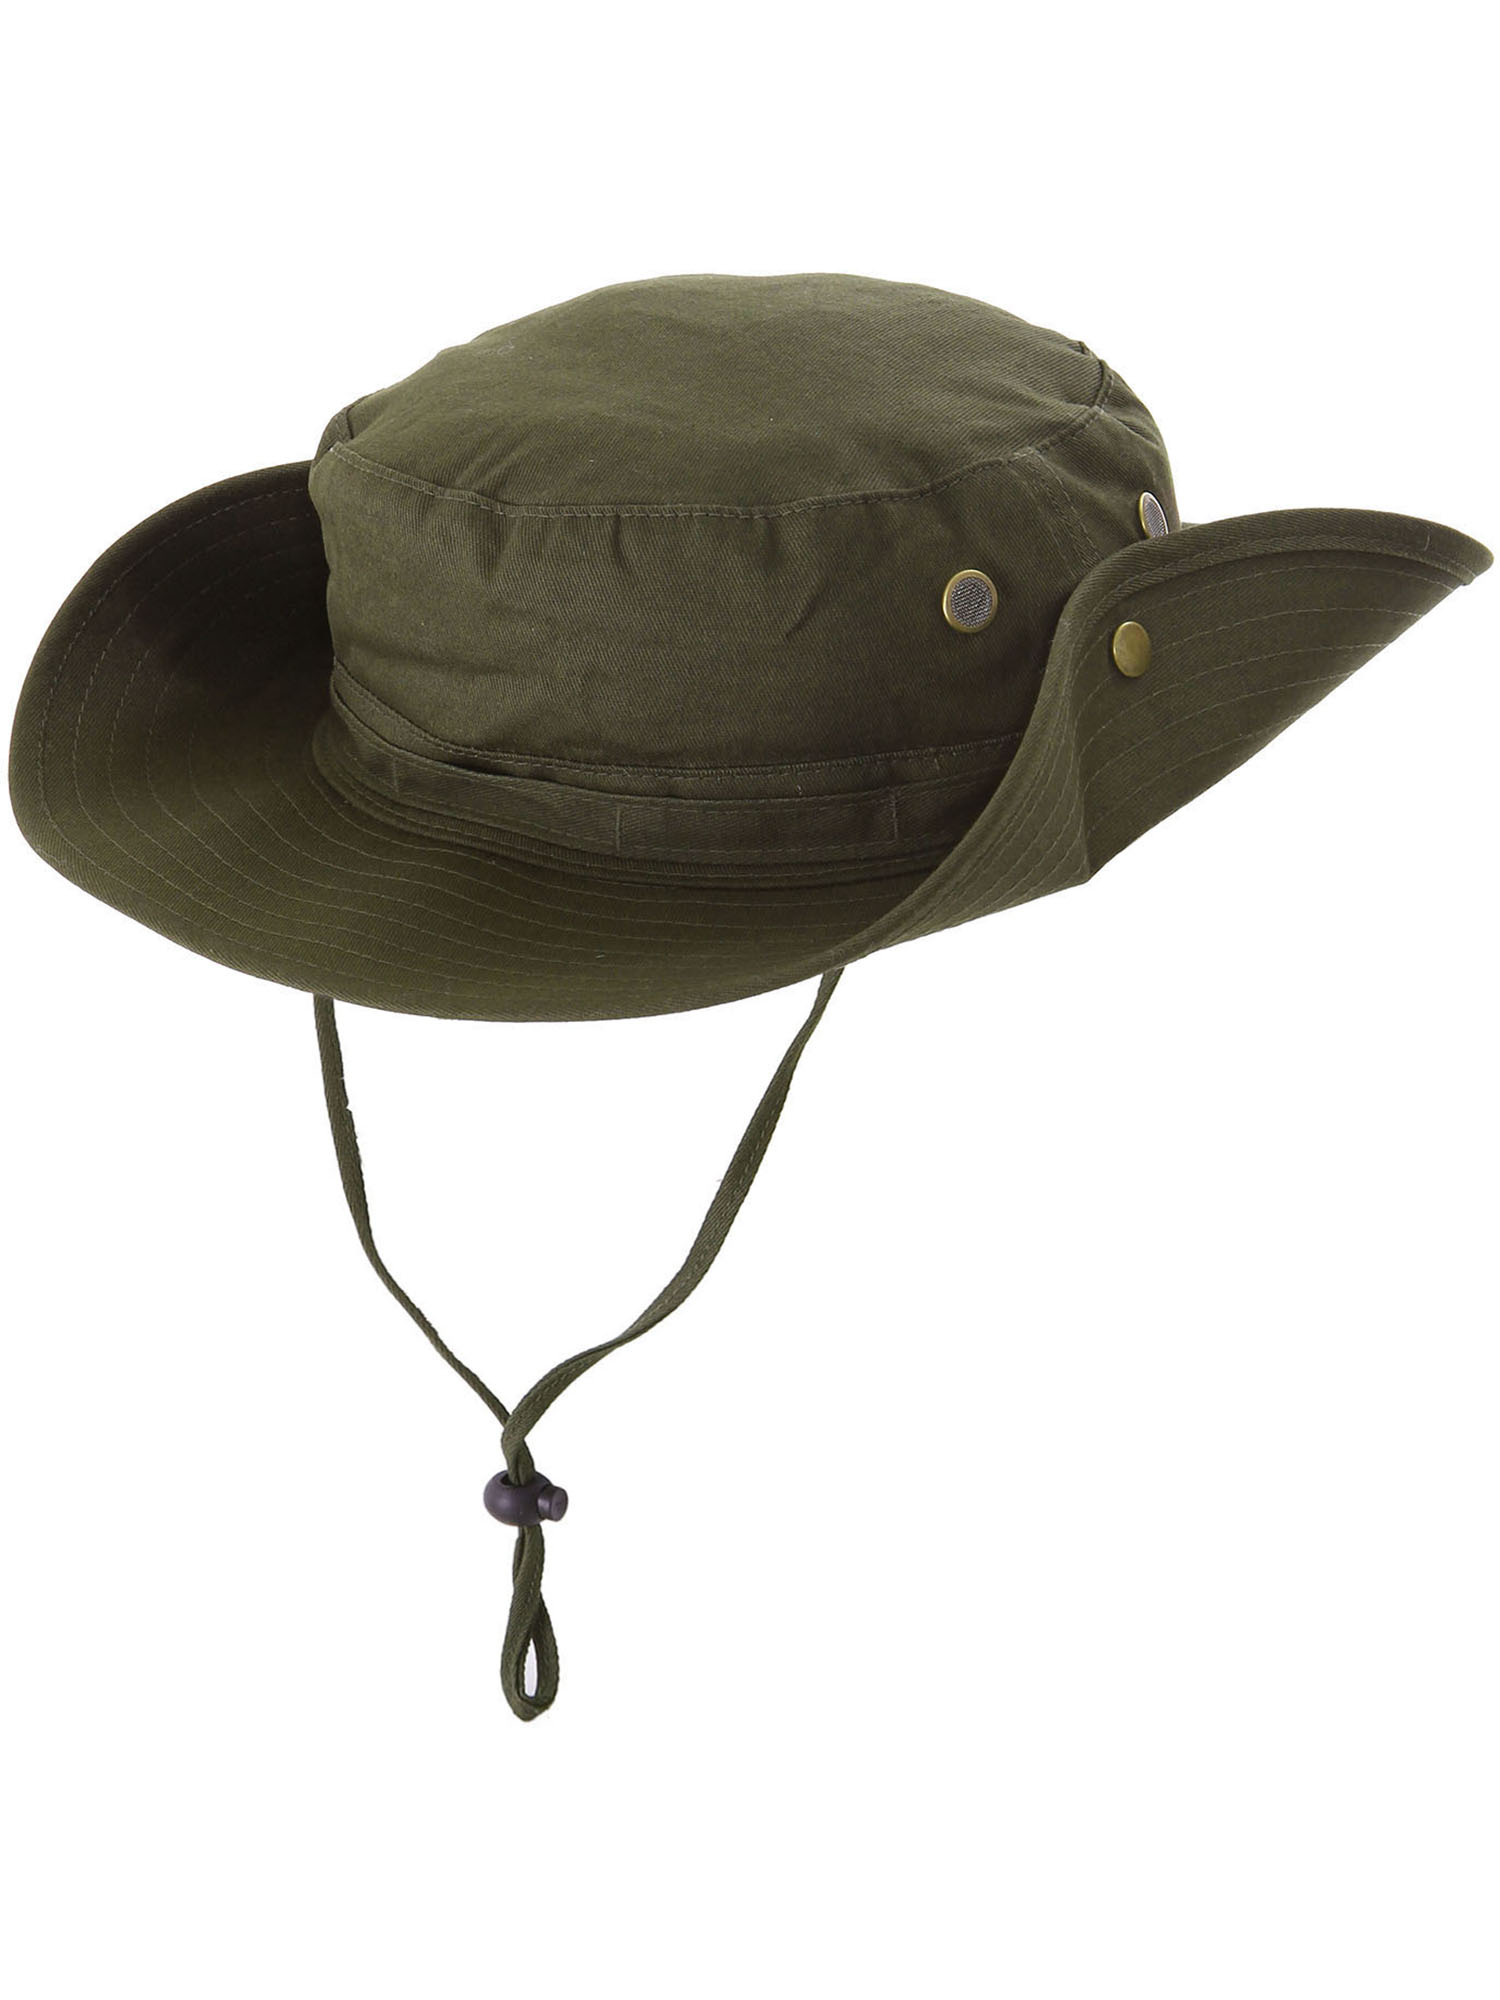 c5a631d8 Simplicity - Top Headwear Safari Explorer Bucket Hat Outdoor Hunting Cap,  Digital - Walmart.com